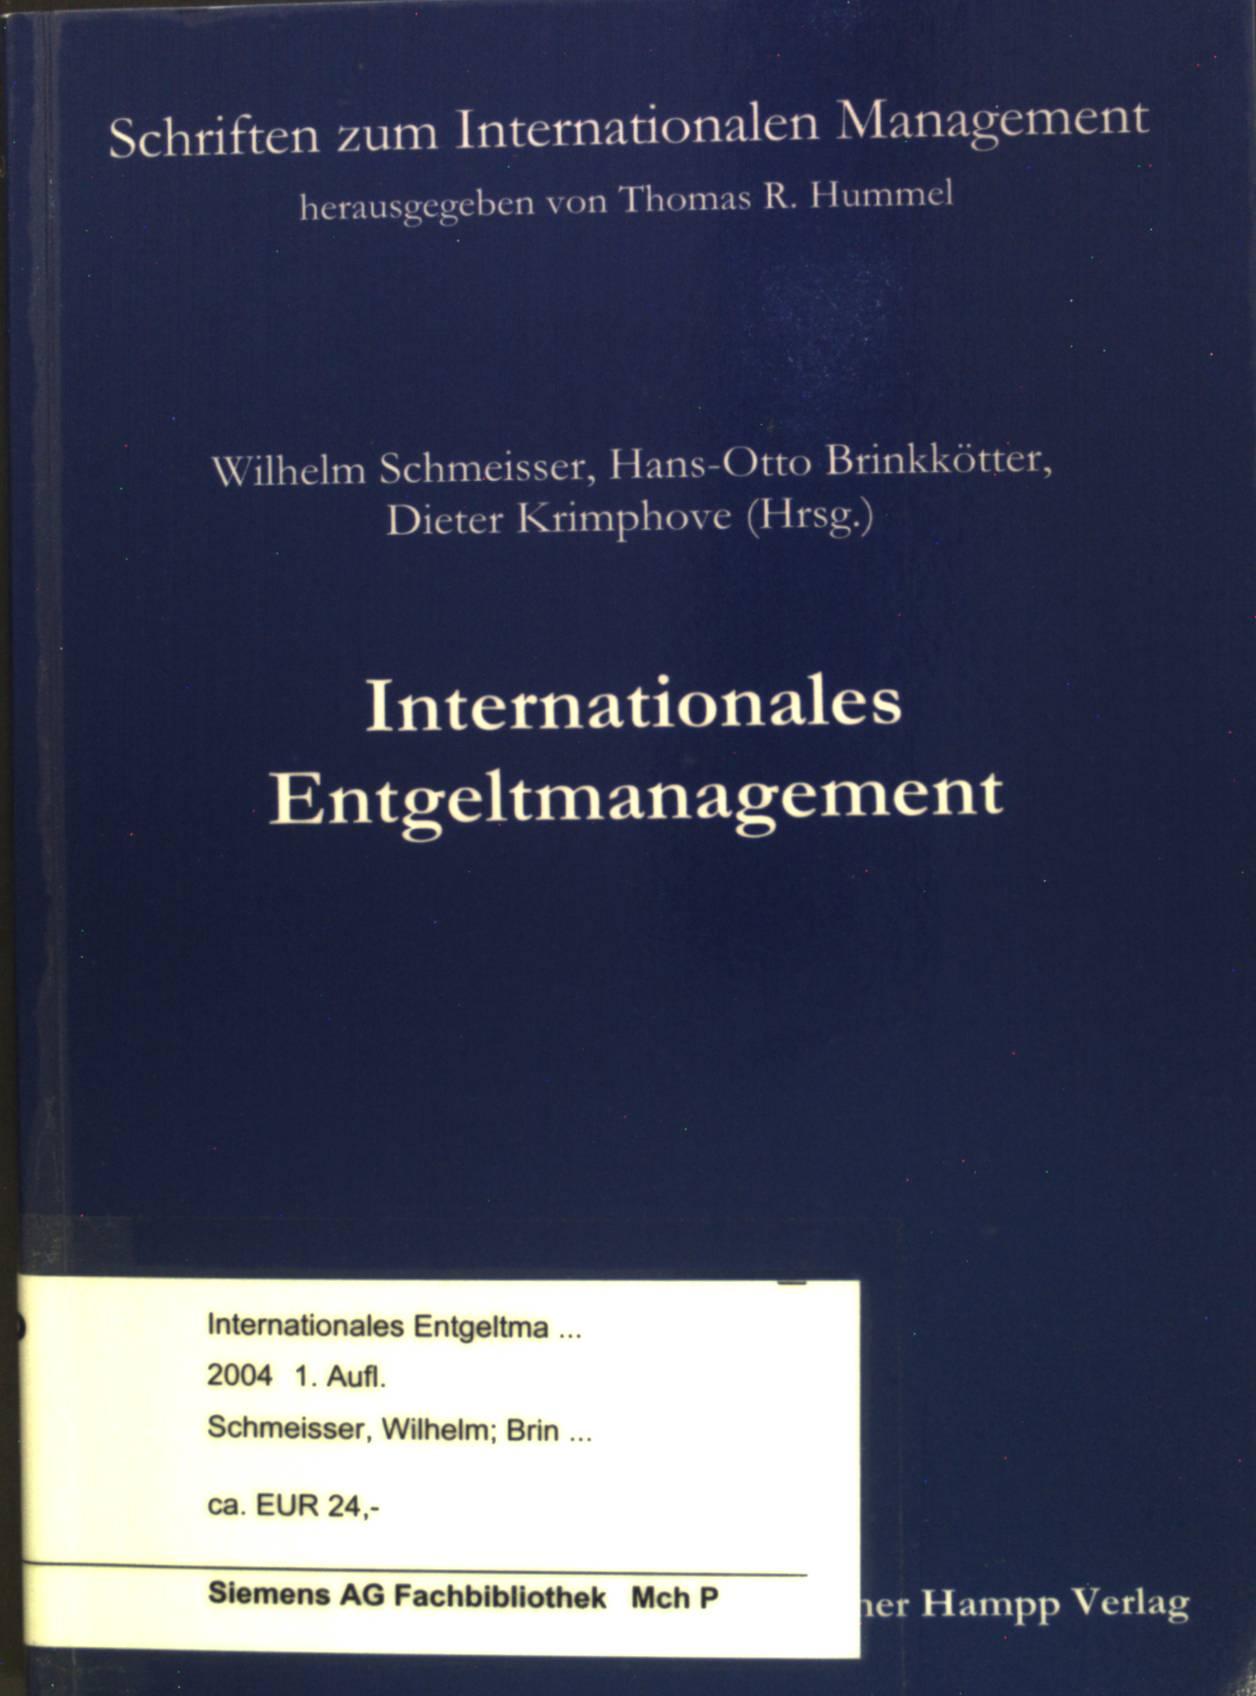 Internationales Entgeltmanagement. Schriften zum Internationalen Management; Band 4. - Schmeisser, Wilhelm